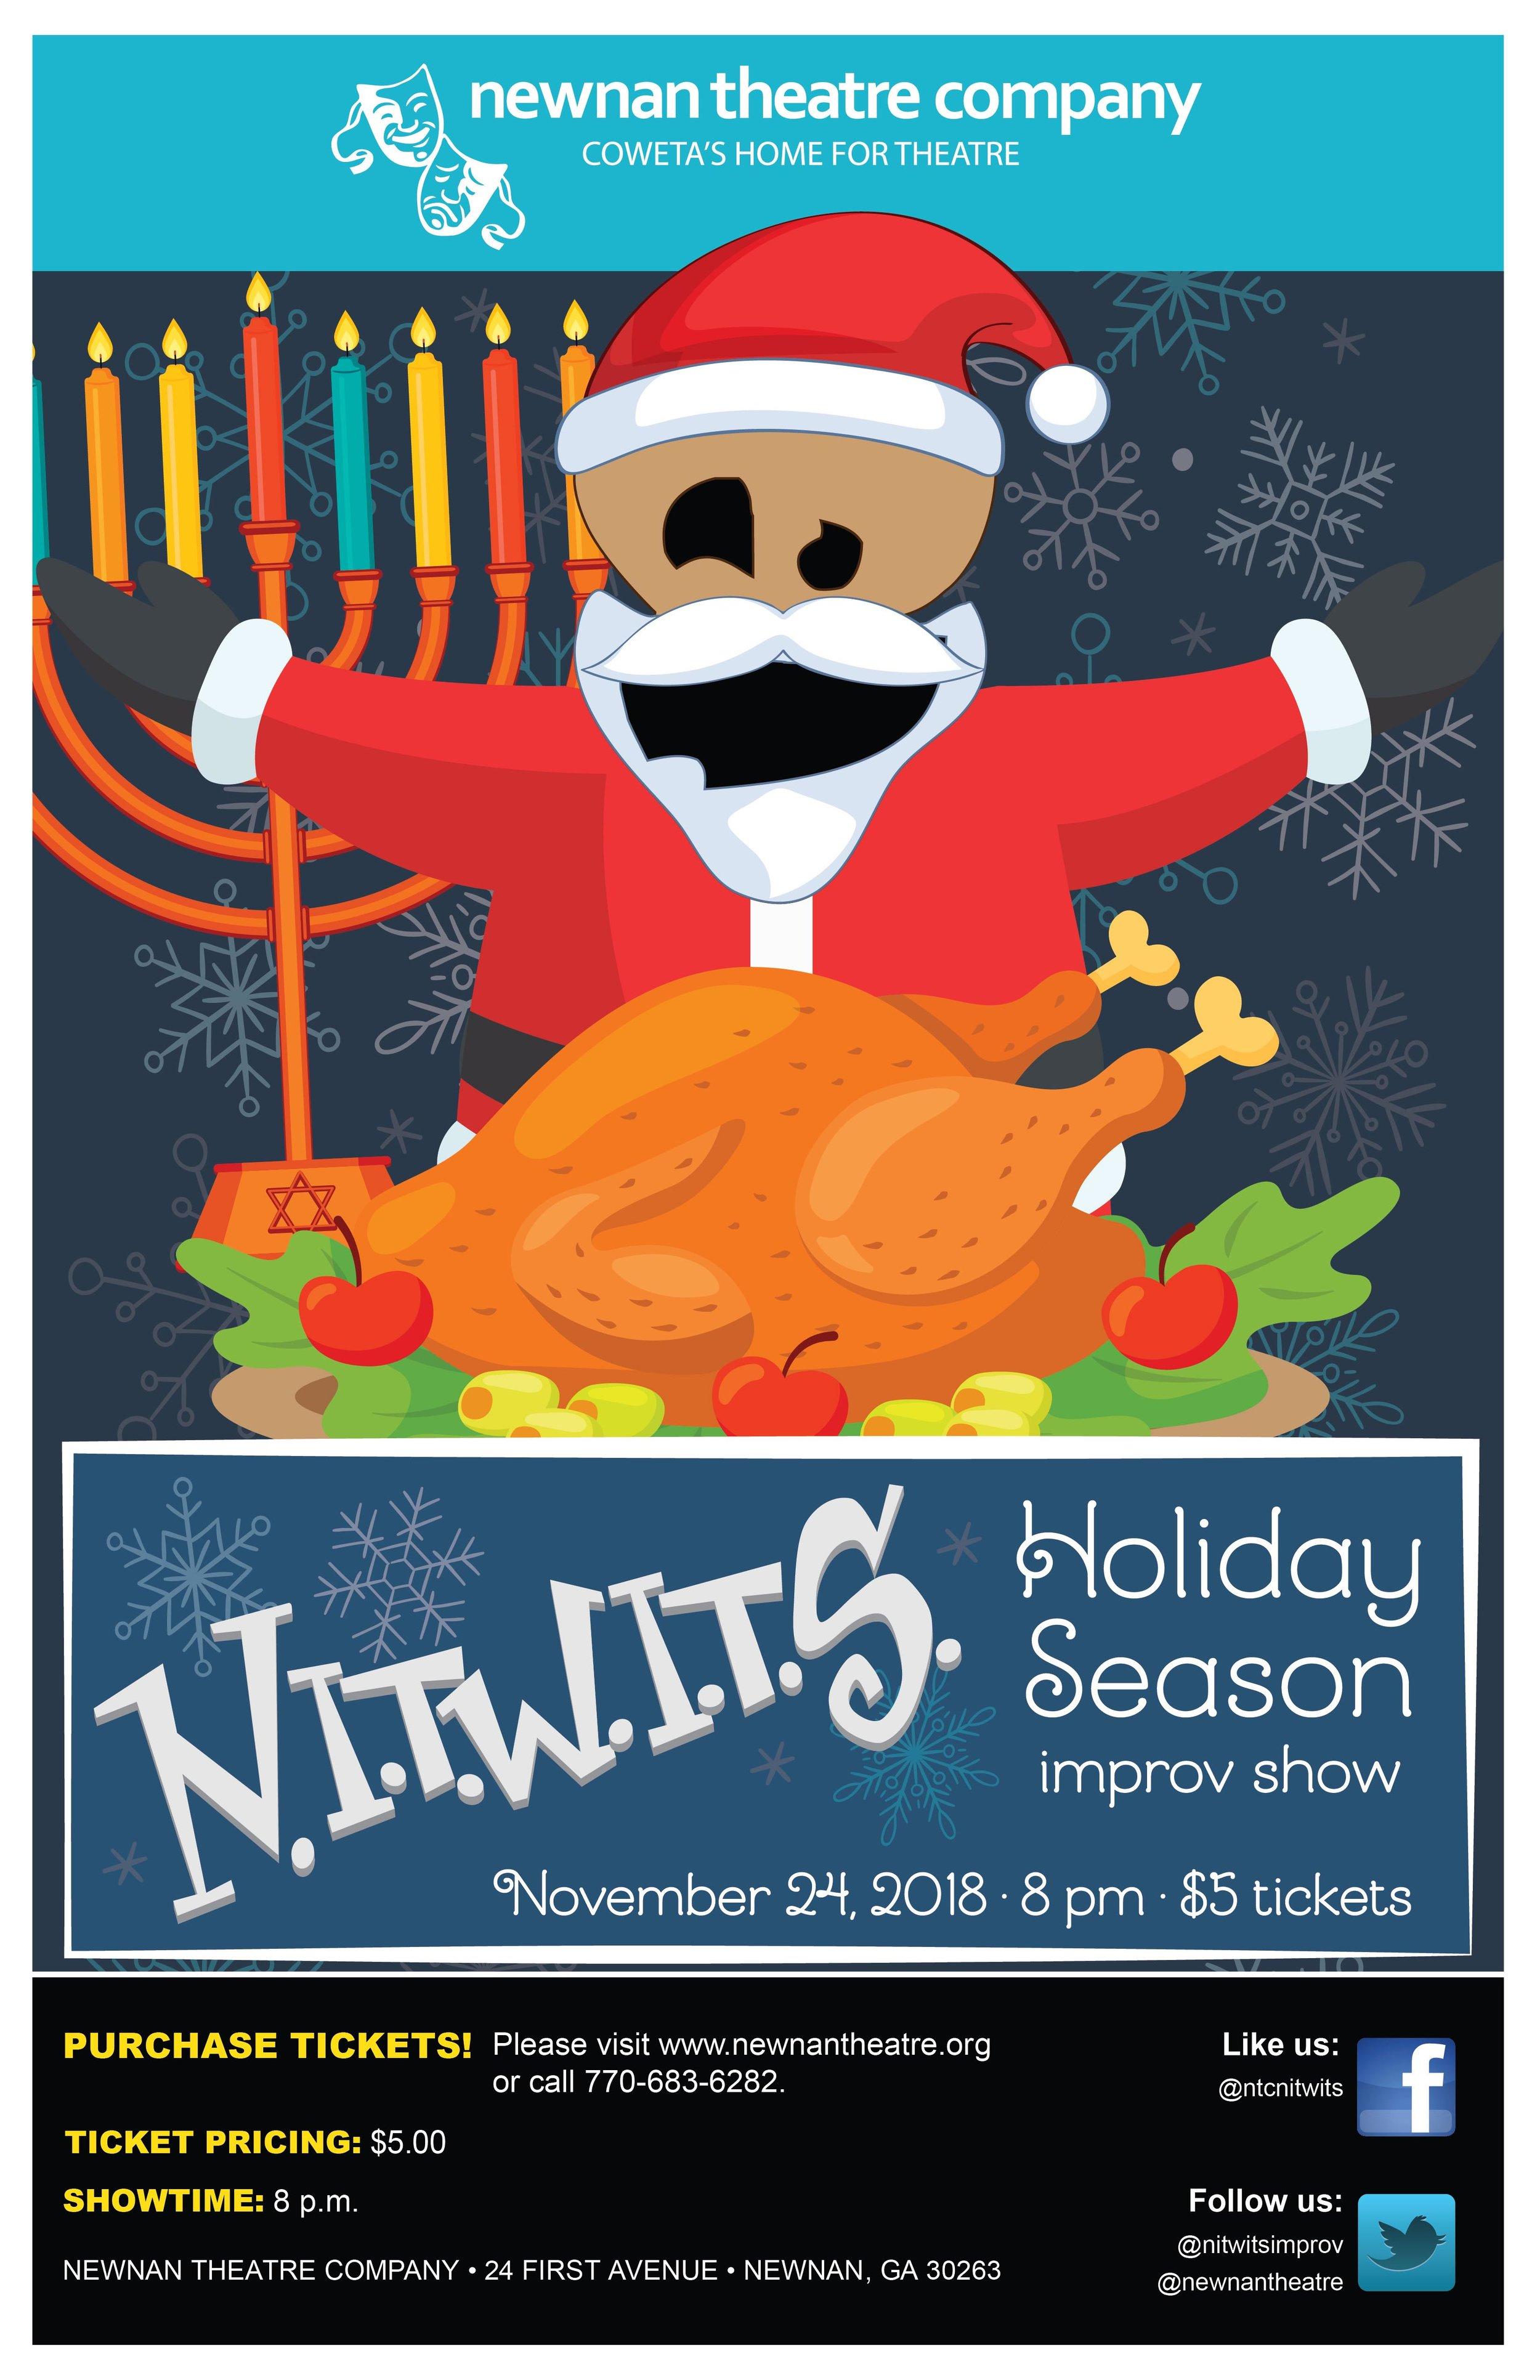 NITWITS Nov 2018 poster 11x17.jpg